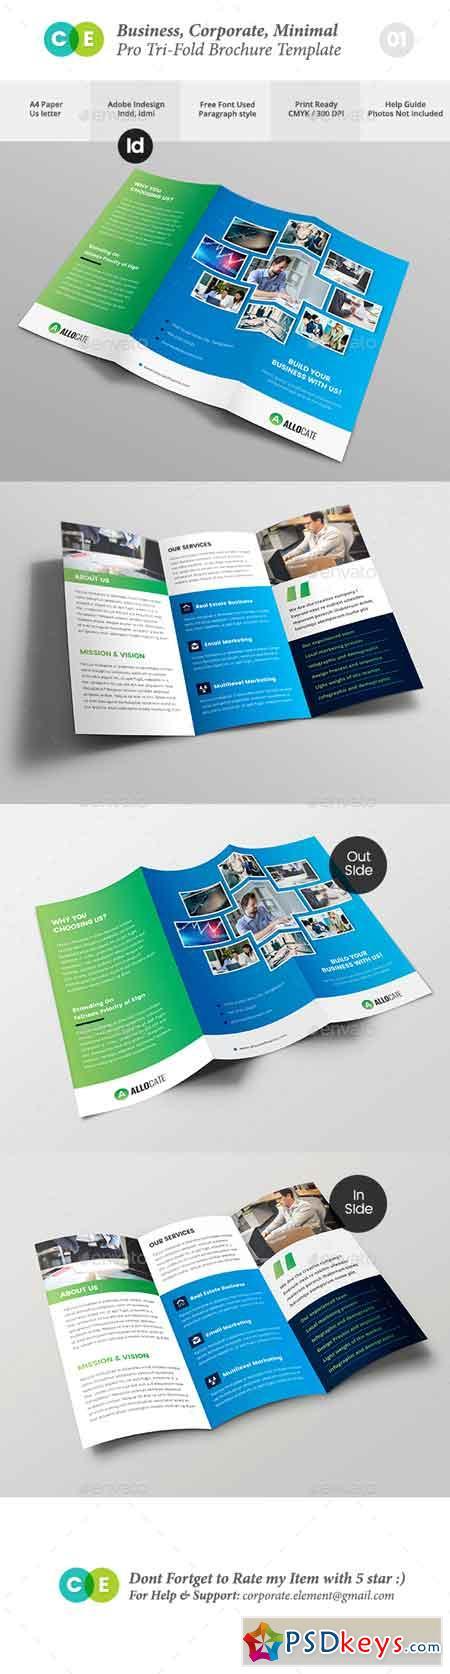 Business Clean Corporate Pro Tri-Fold Brochure V01 20089081